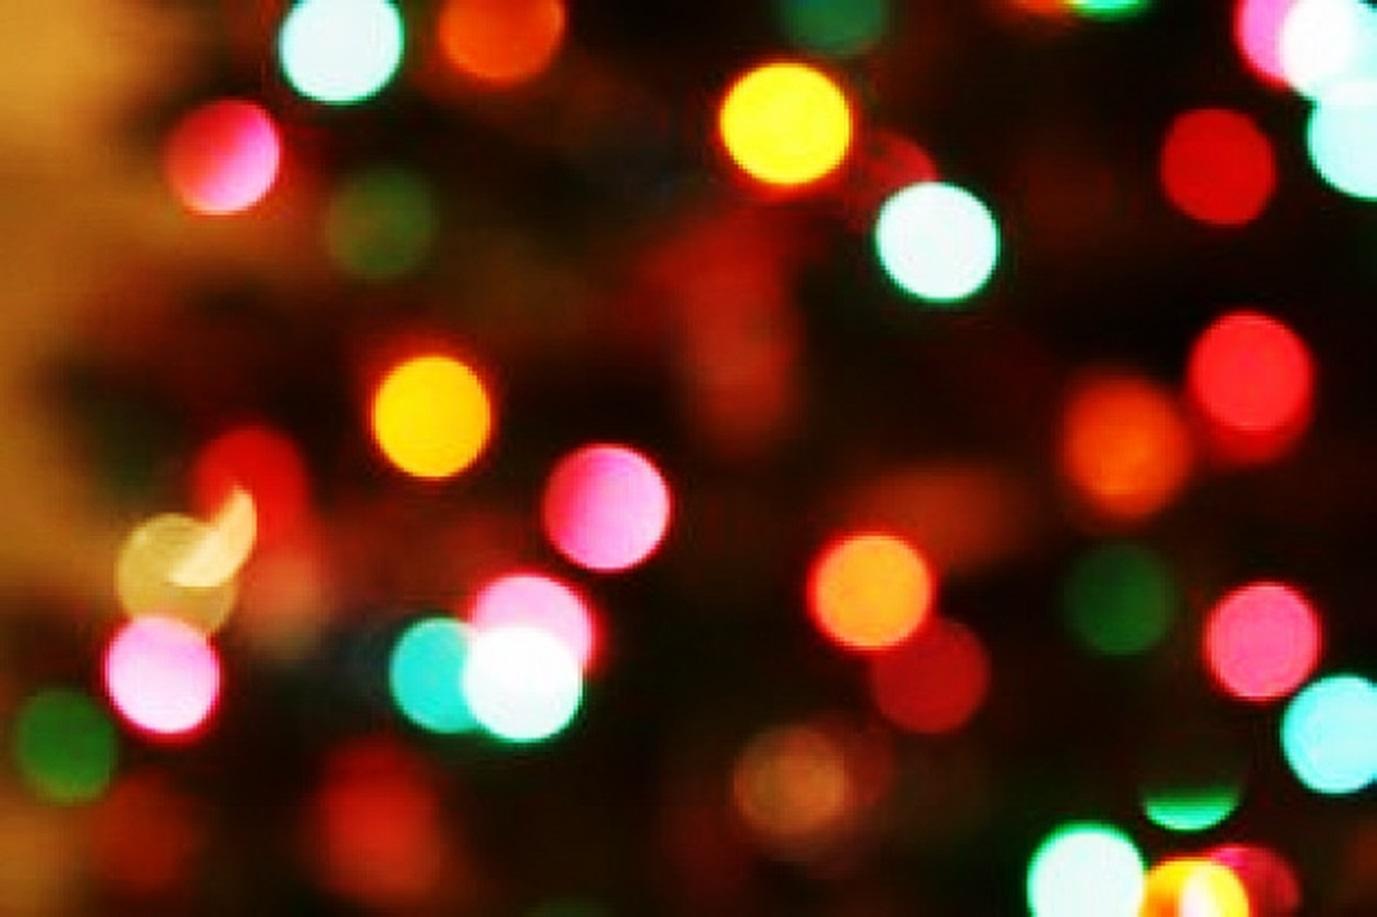 Fin de a o m sica en el coche - Luces para navidad ...